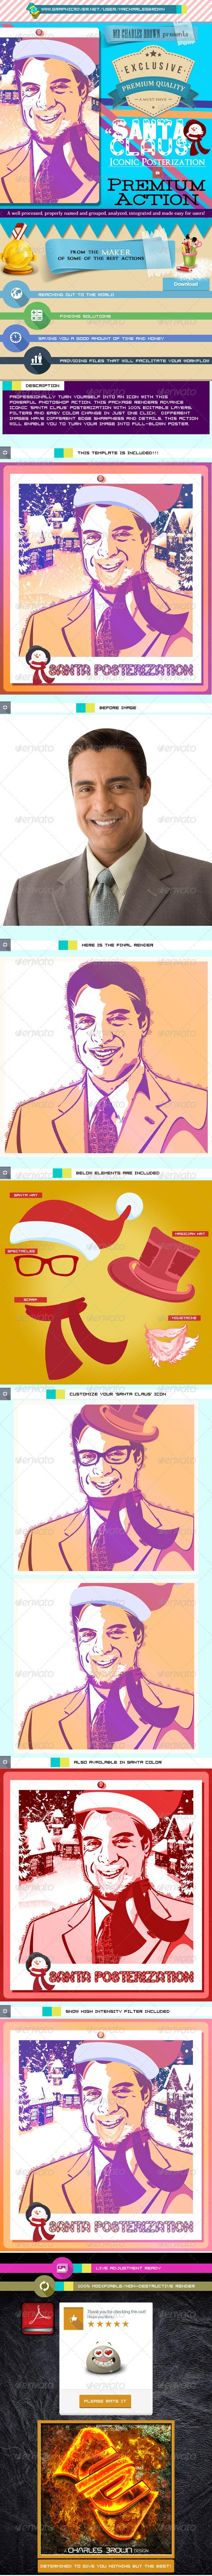 GraphicRiver Santa Claus Iconic Posterization Kit 6319113